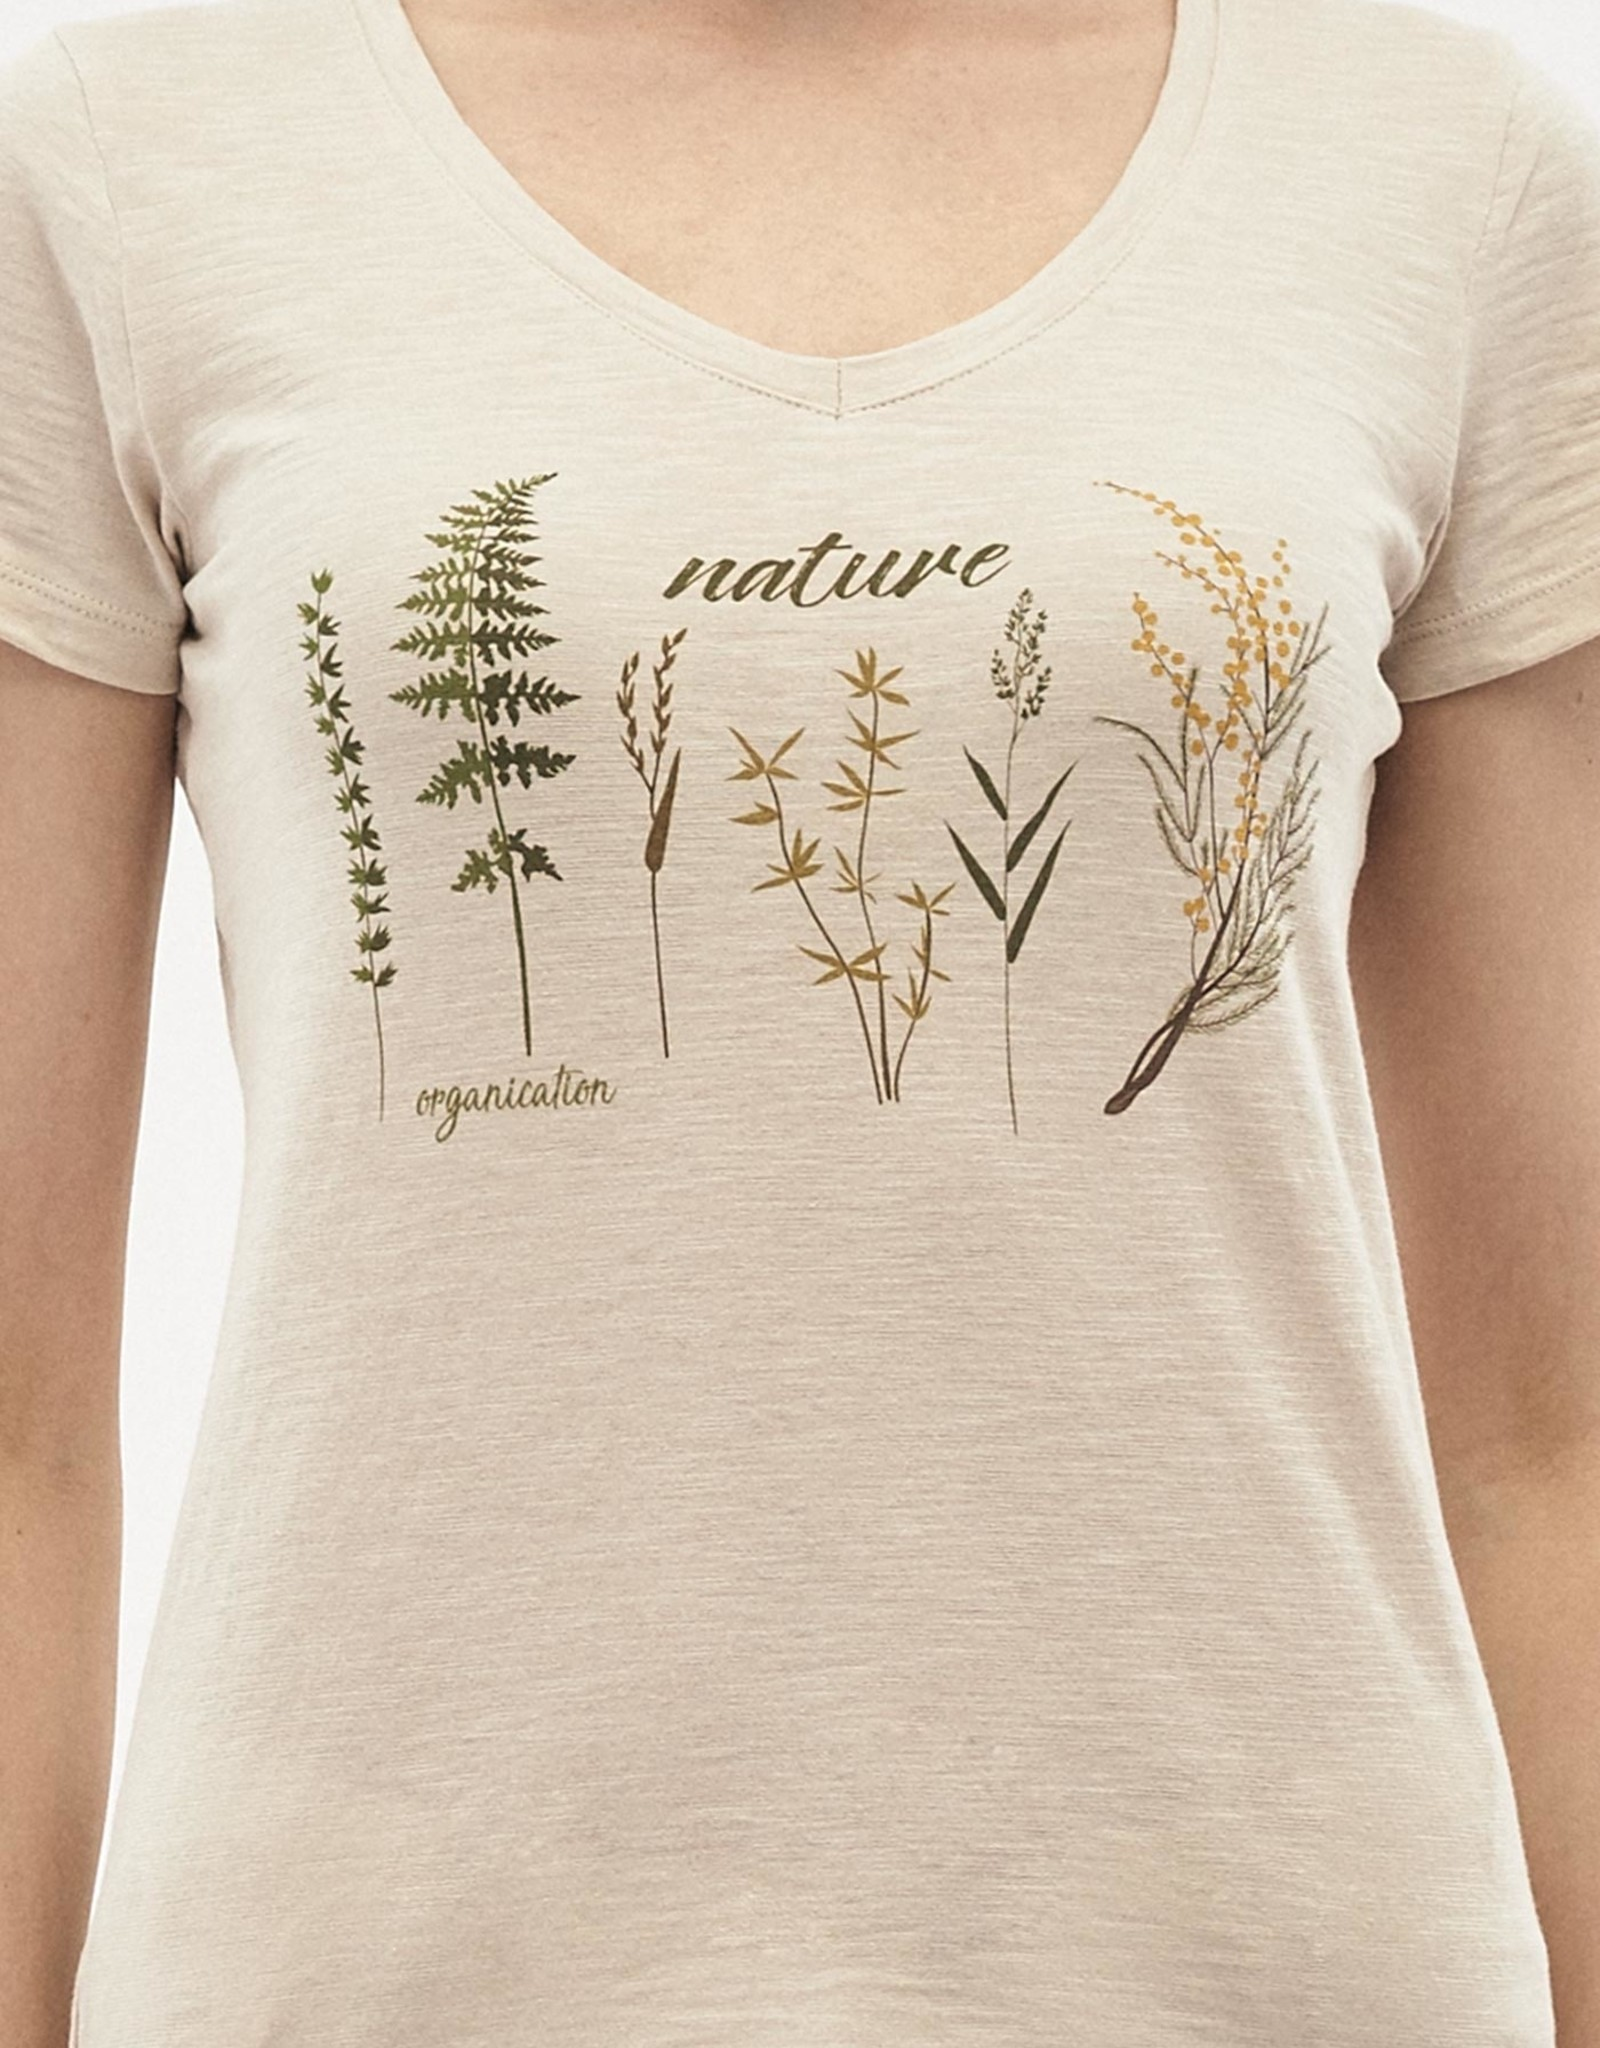 Organication T-SHIRT PRINT NATURE BEIGE